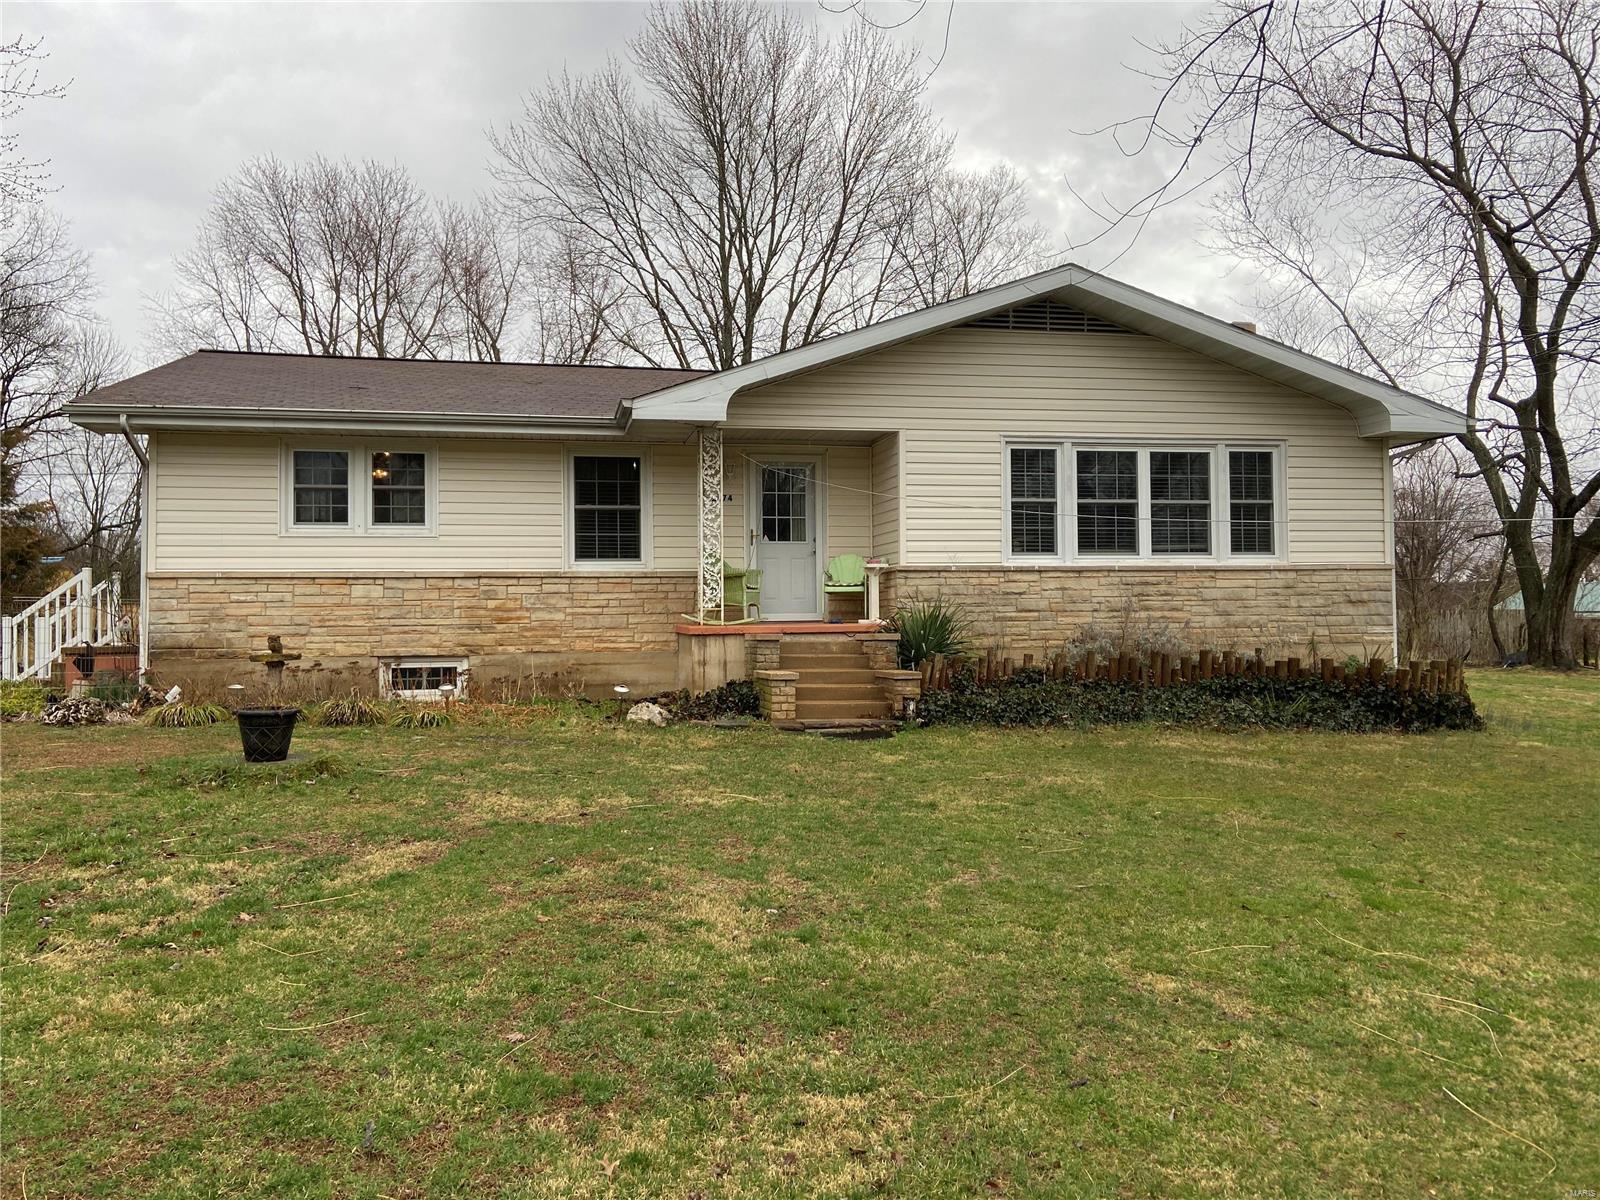 2674 Birch Property Photo - Doe Run, MO real estate listing